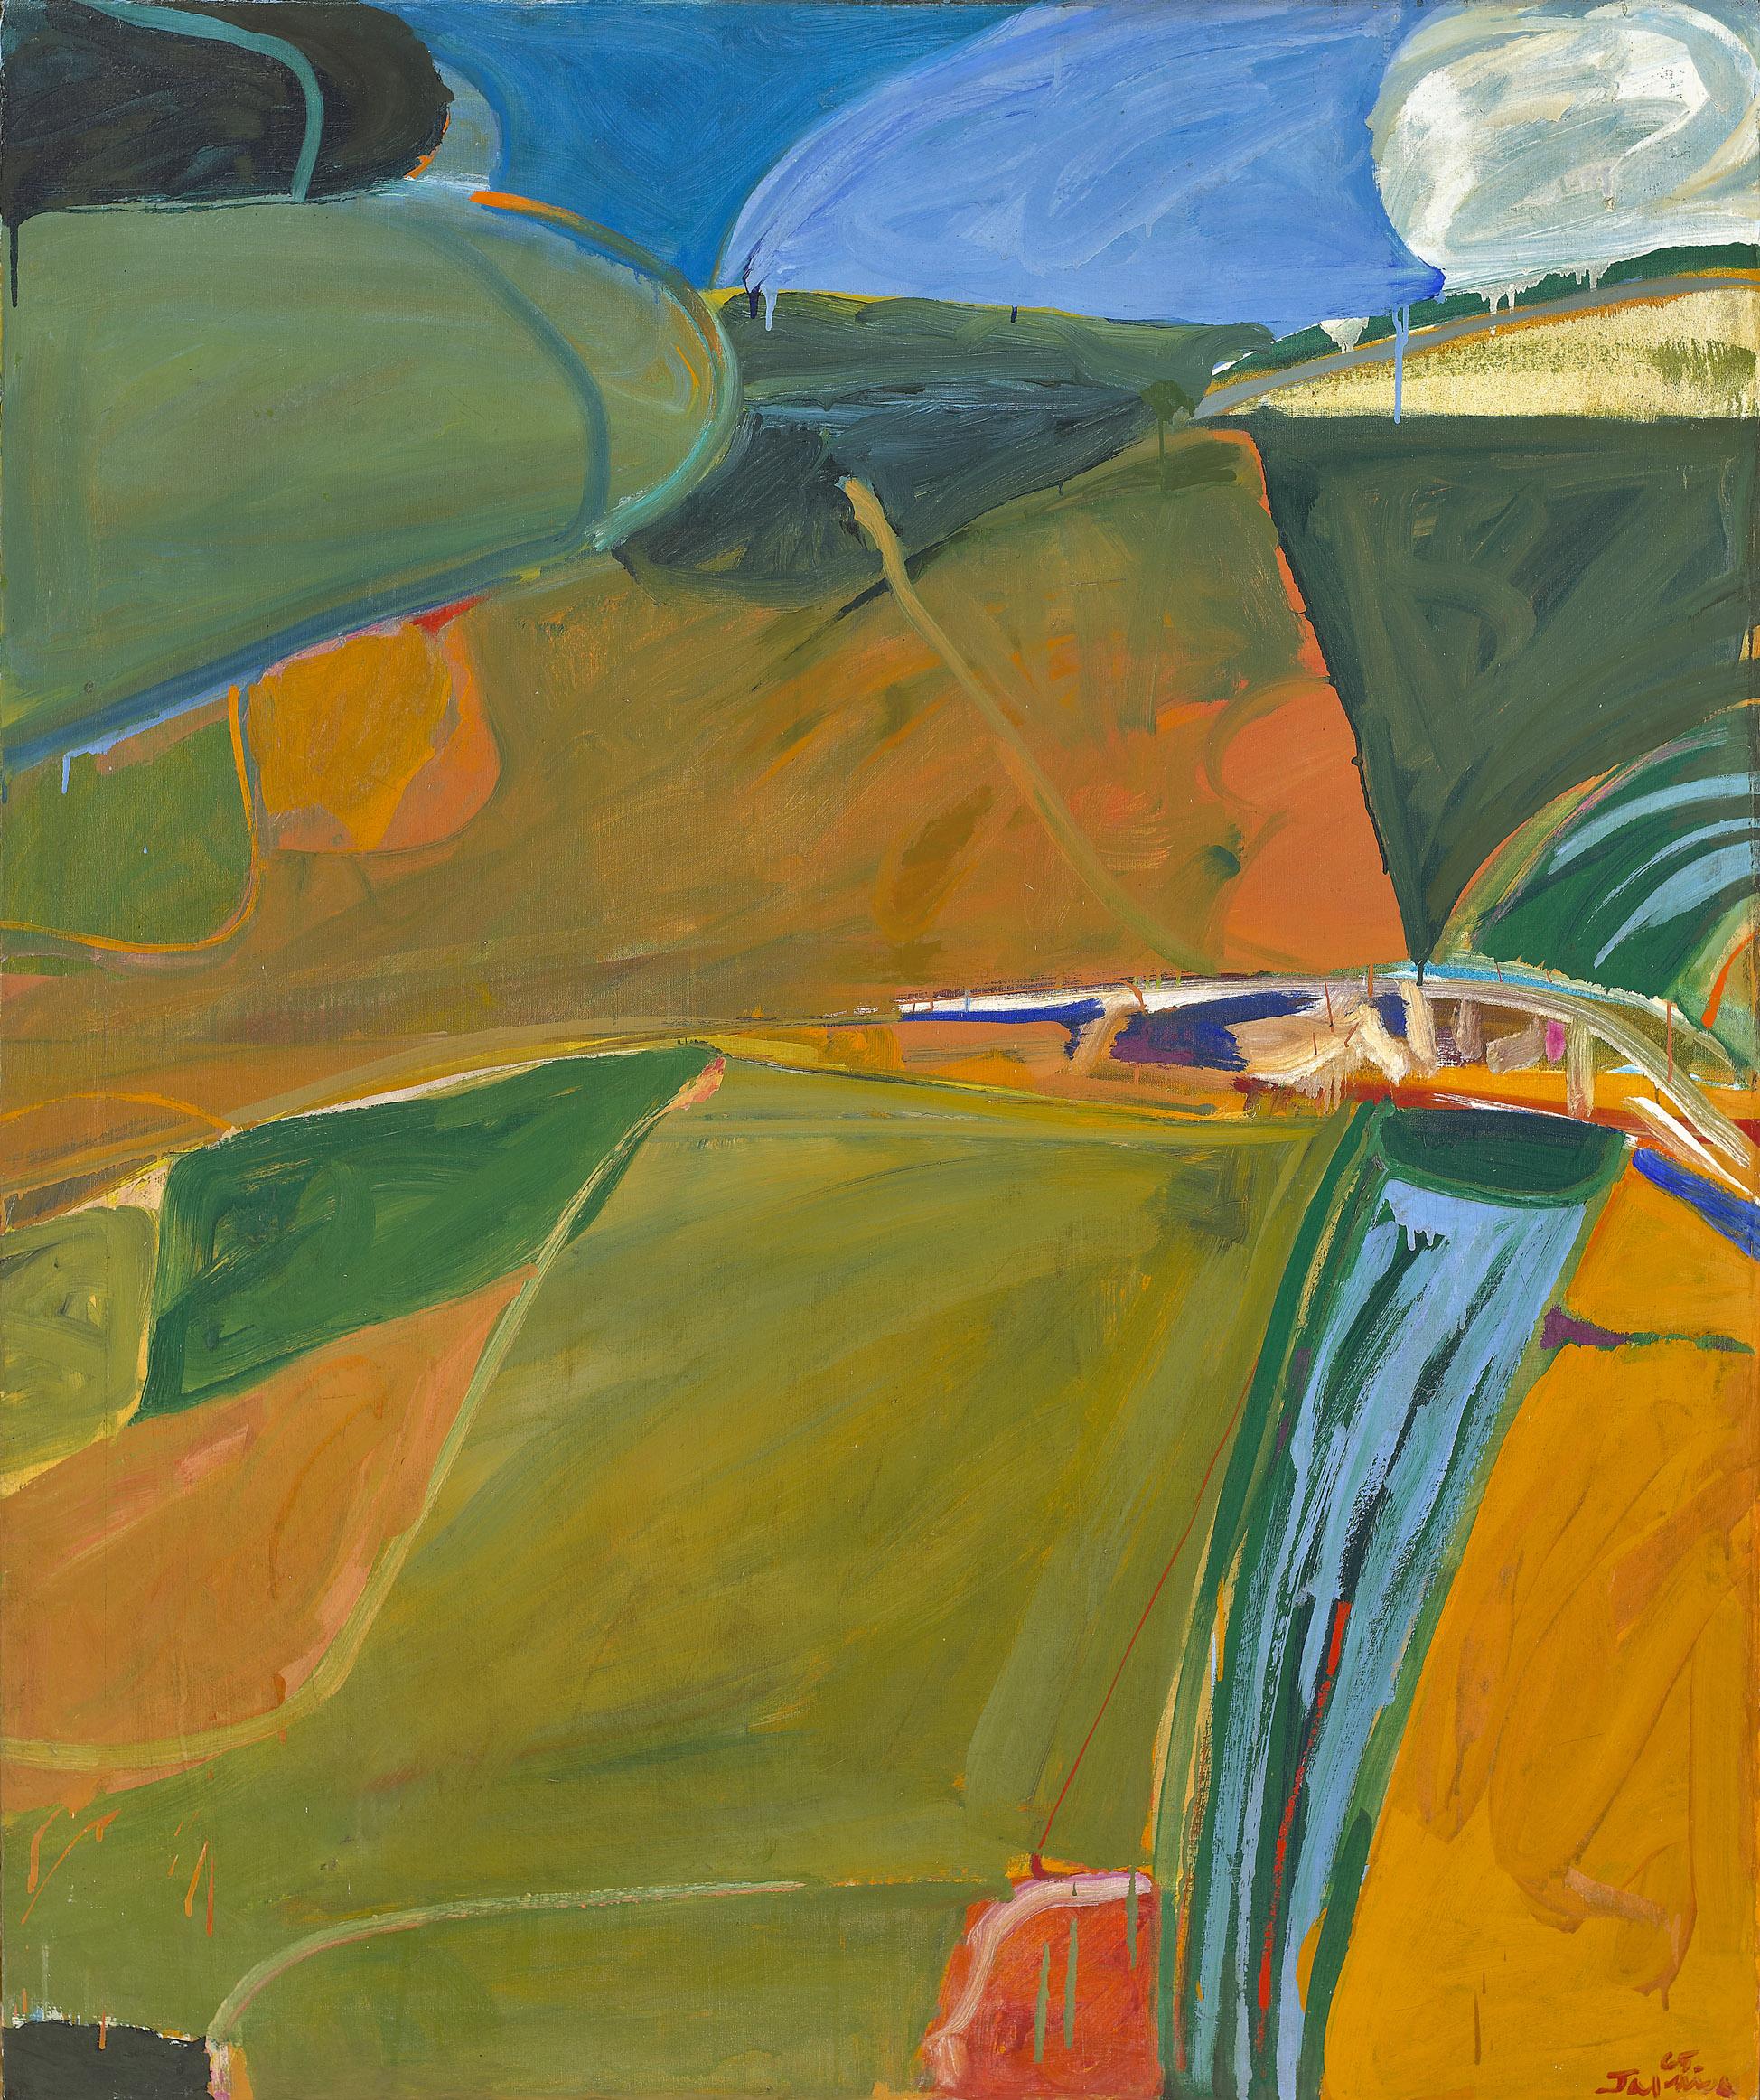 Hudson River Series (The Bridge to Alcazar) , 1965 oil on canvas 61 x 51 1/2 inches; 154.9 x 130.8 centimeters